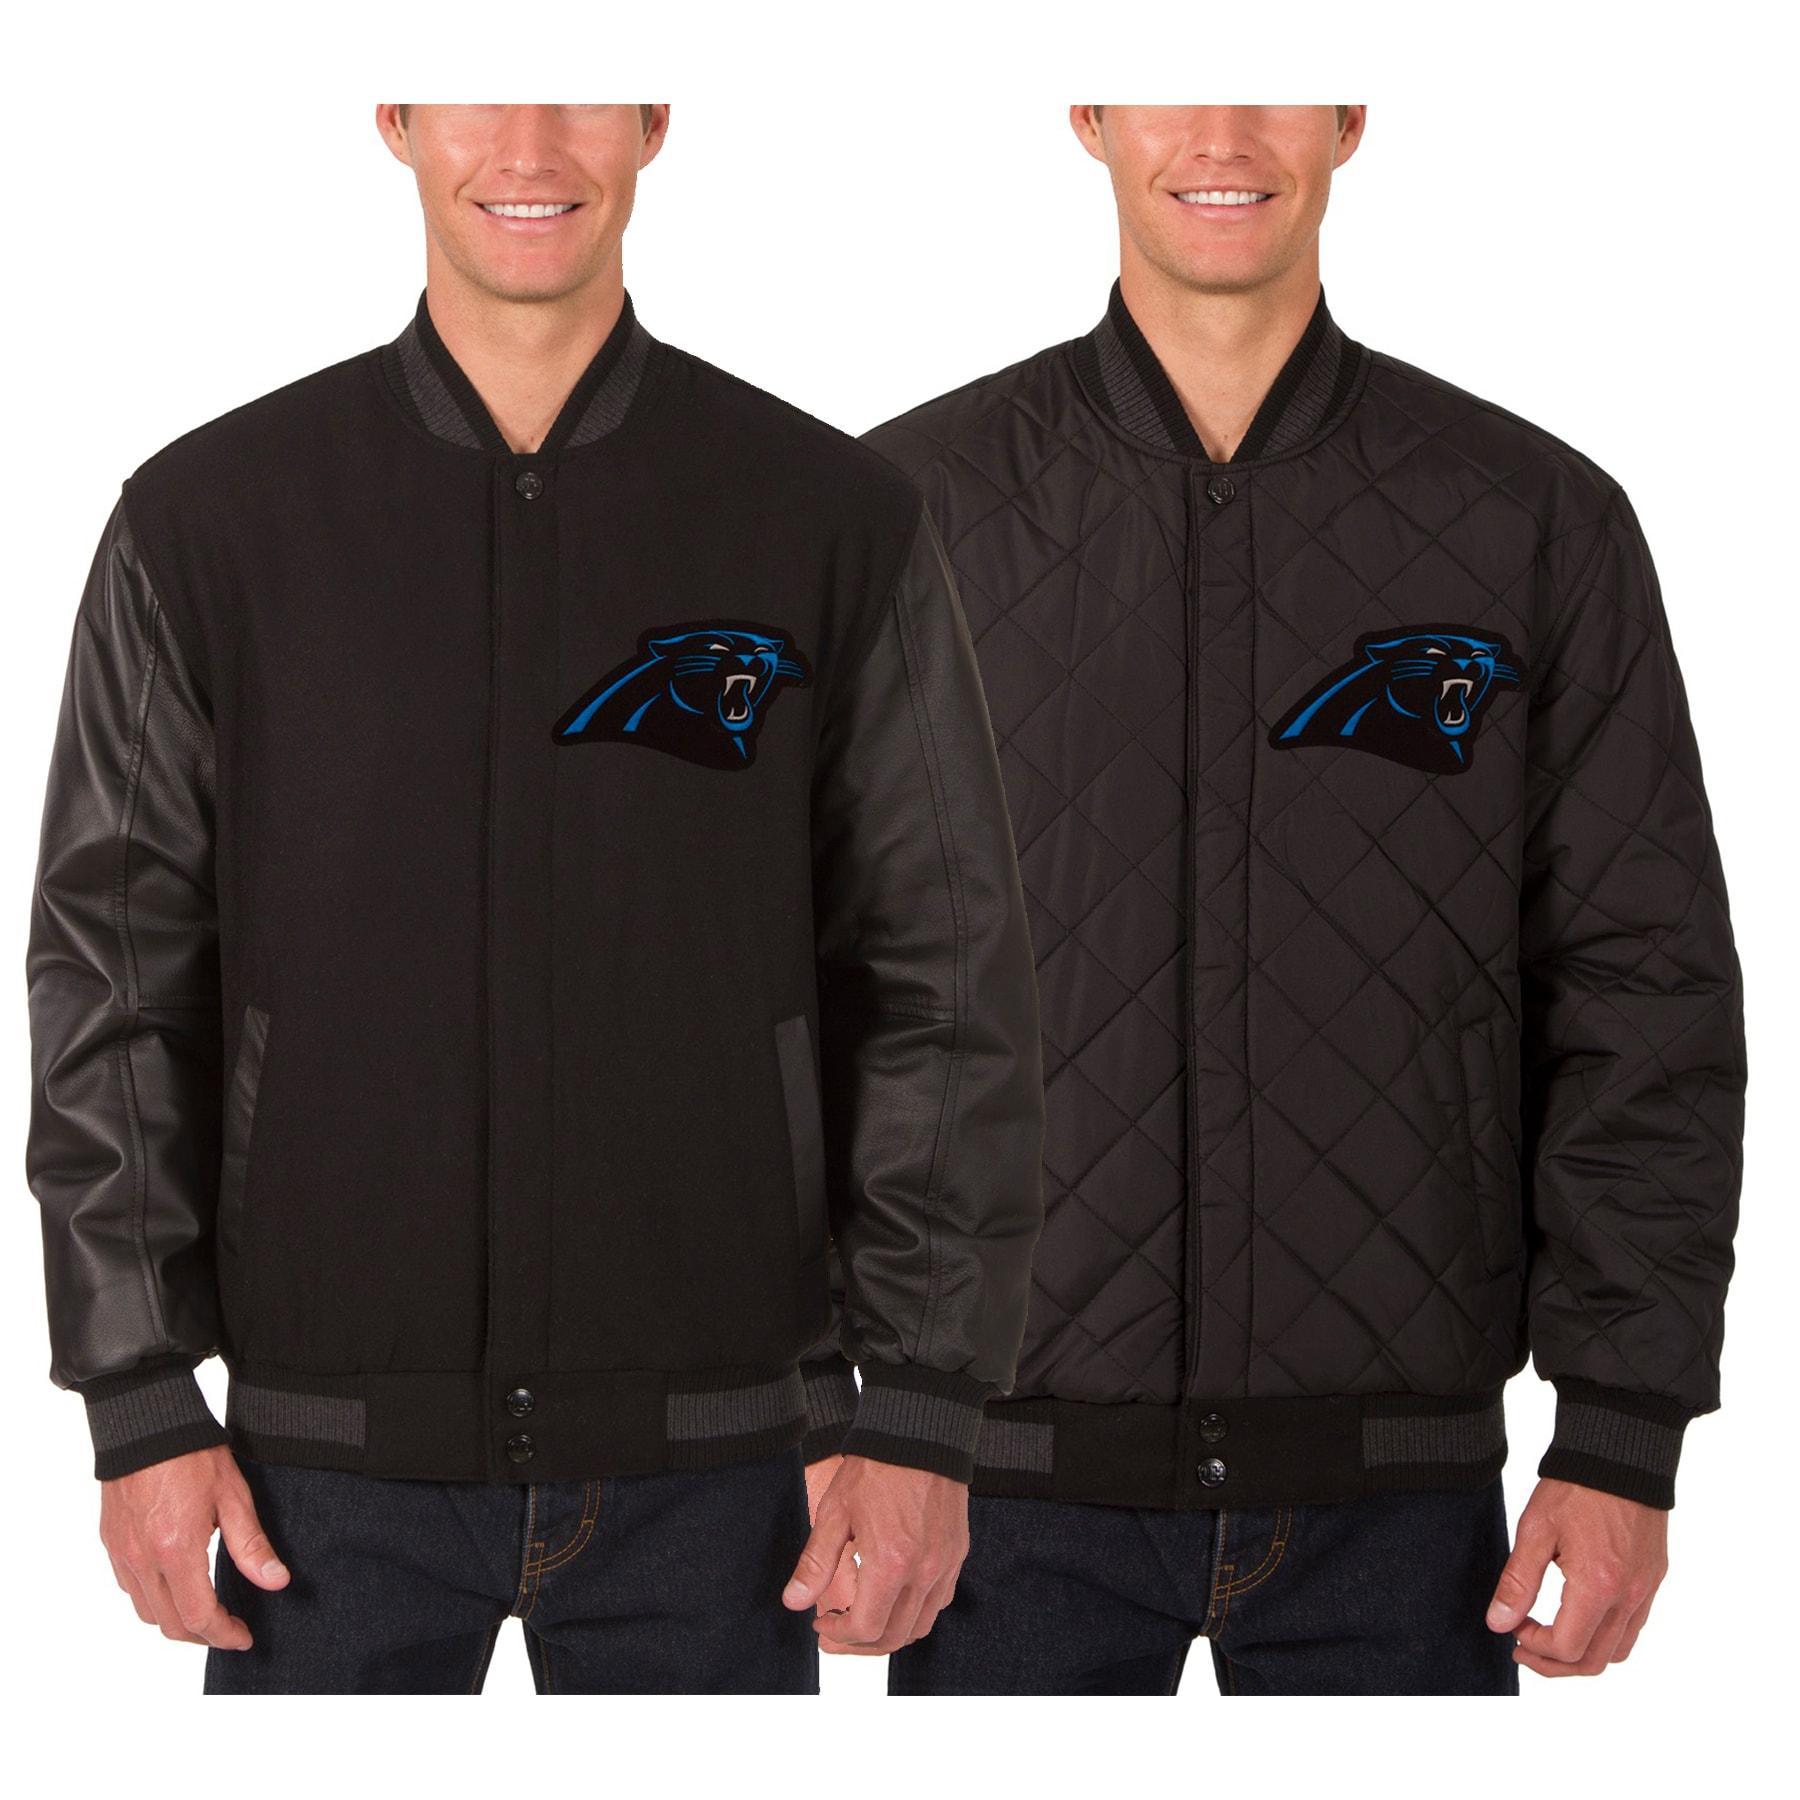 Carolina Panthers JH Design Wool & Leather Reversible Jacket with Embroidered Logos - Black